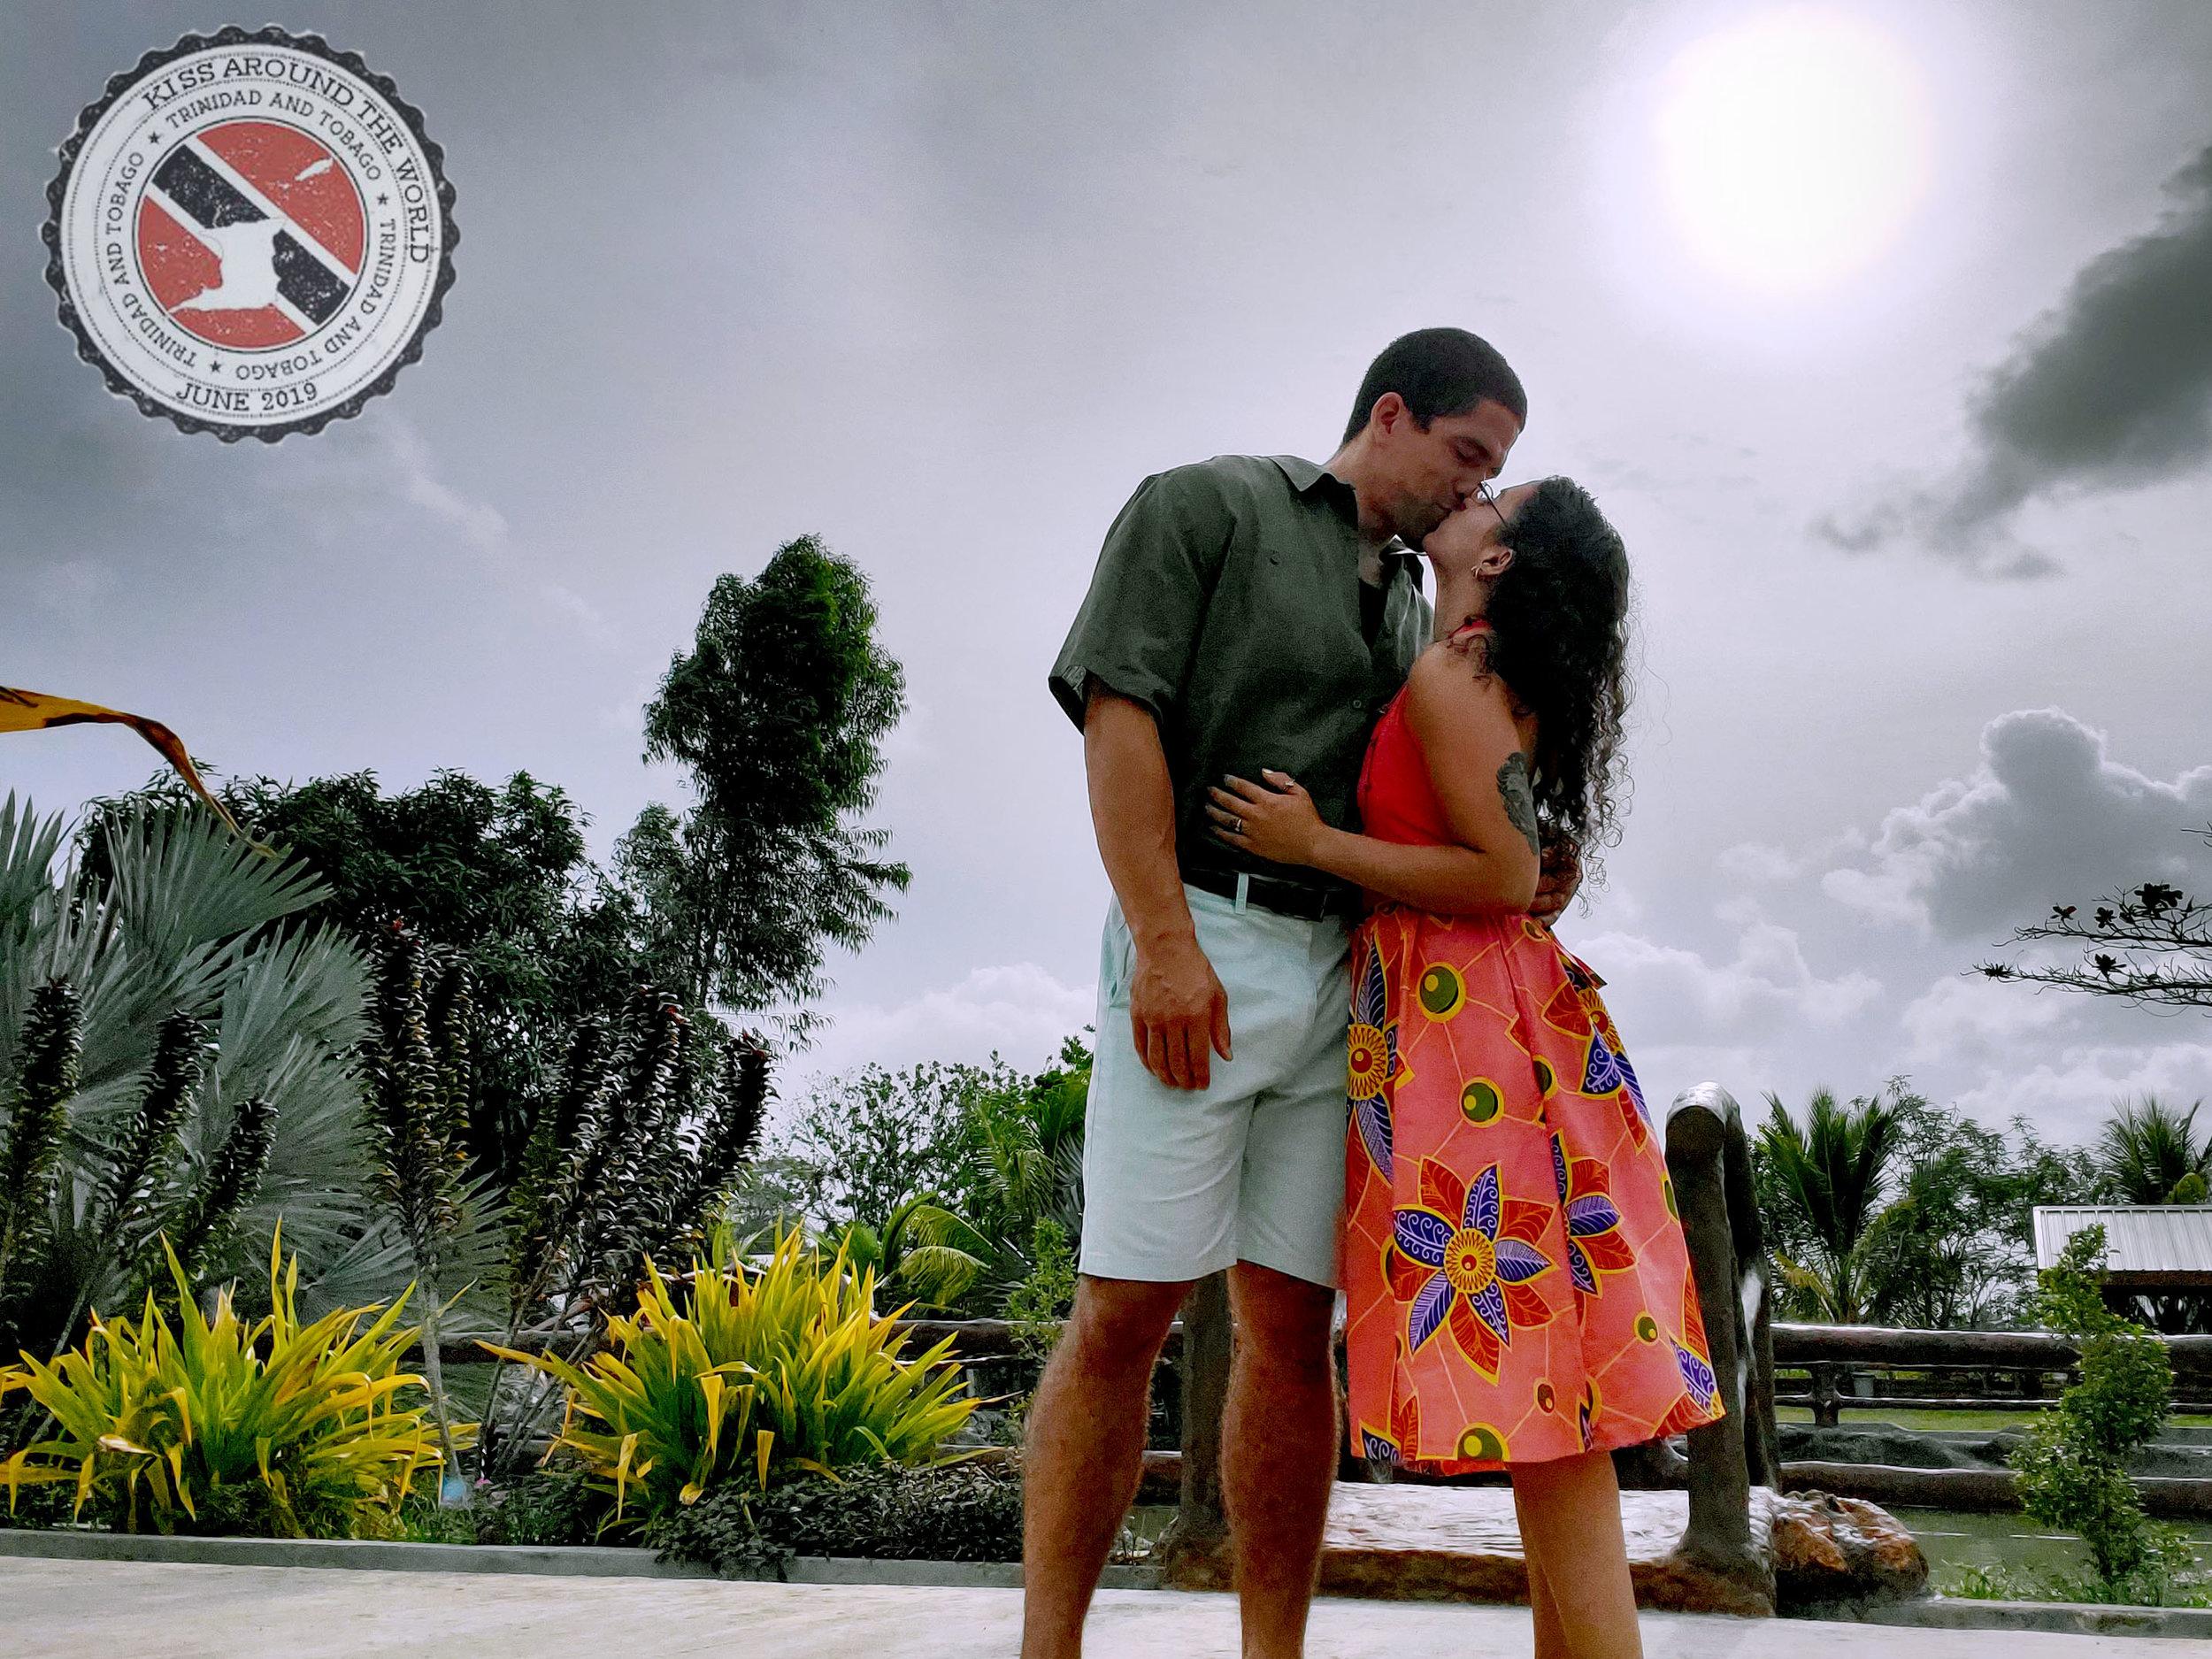 TRINIDAD&tabago_vickygood_photography_kiss-around-the-world.jpg